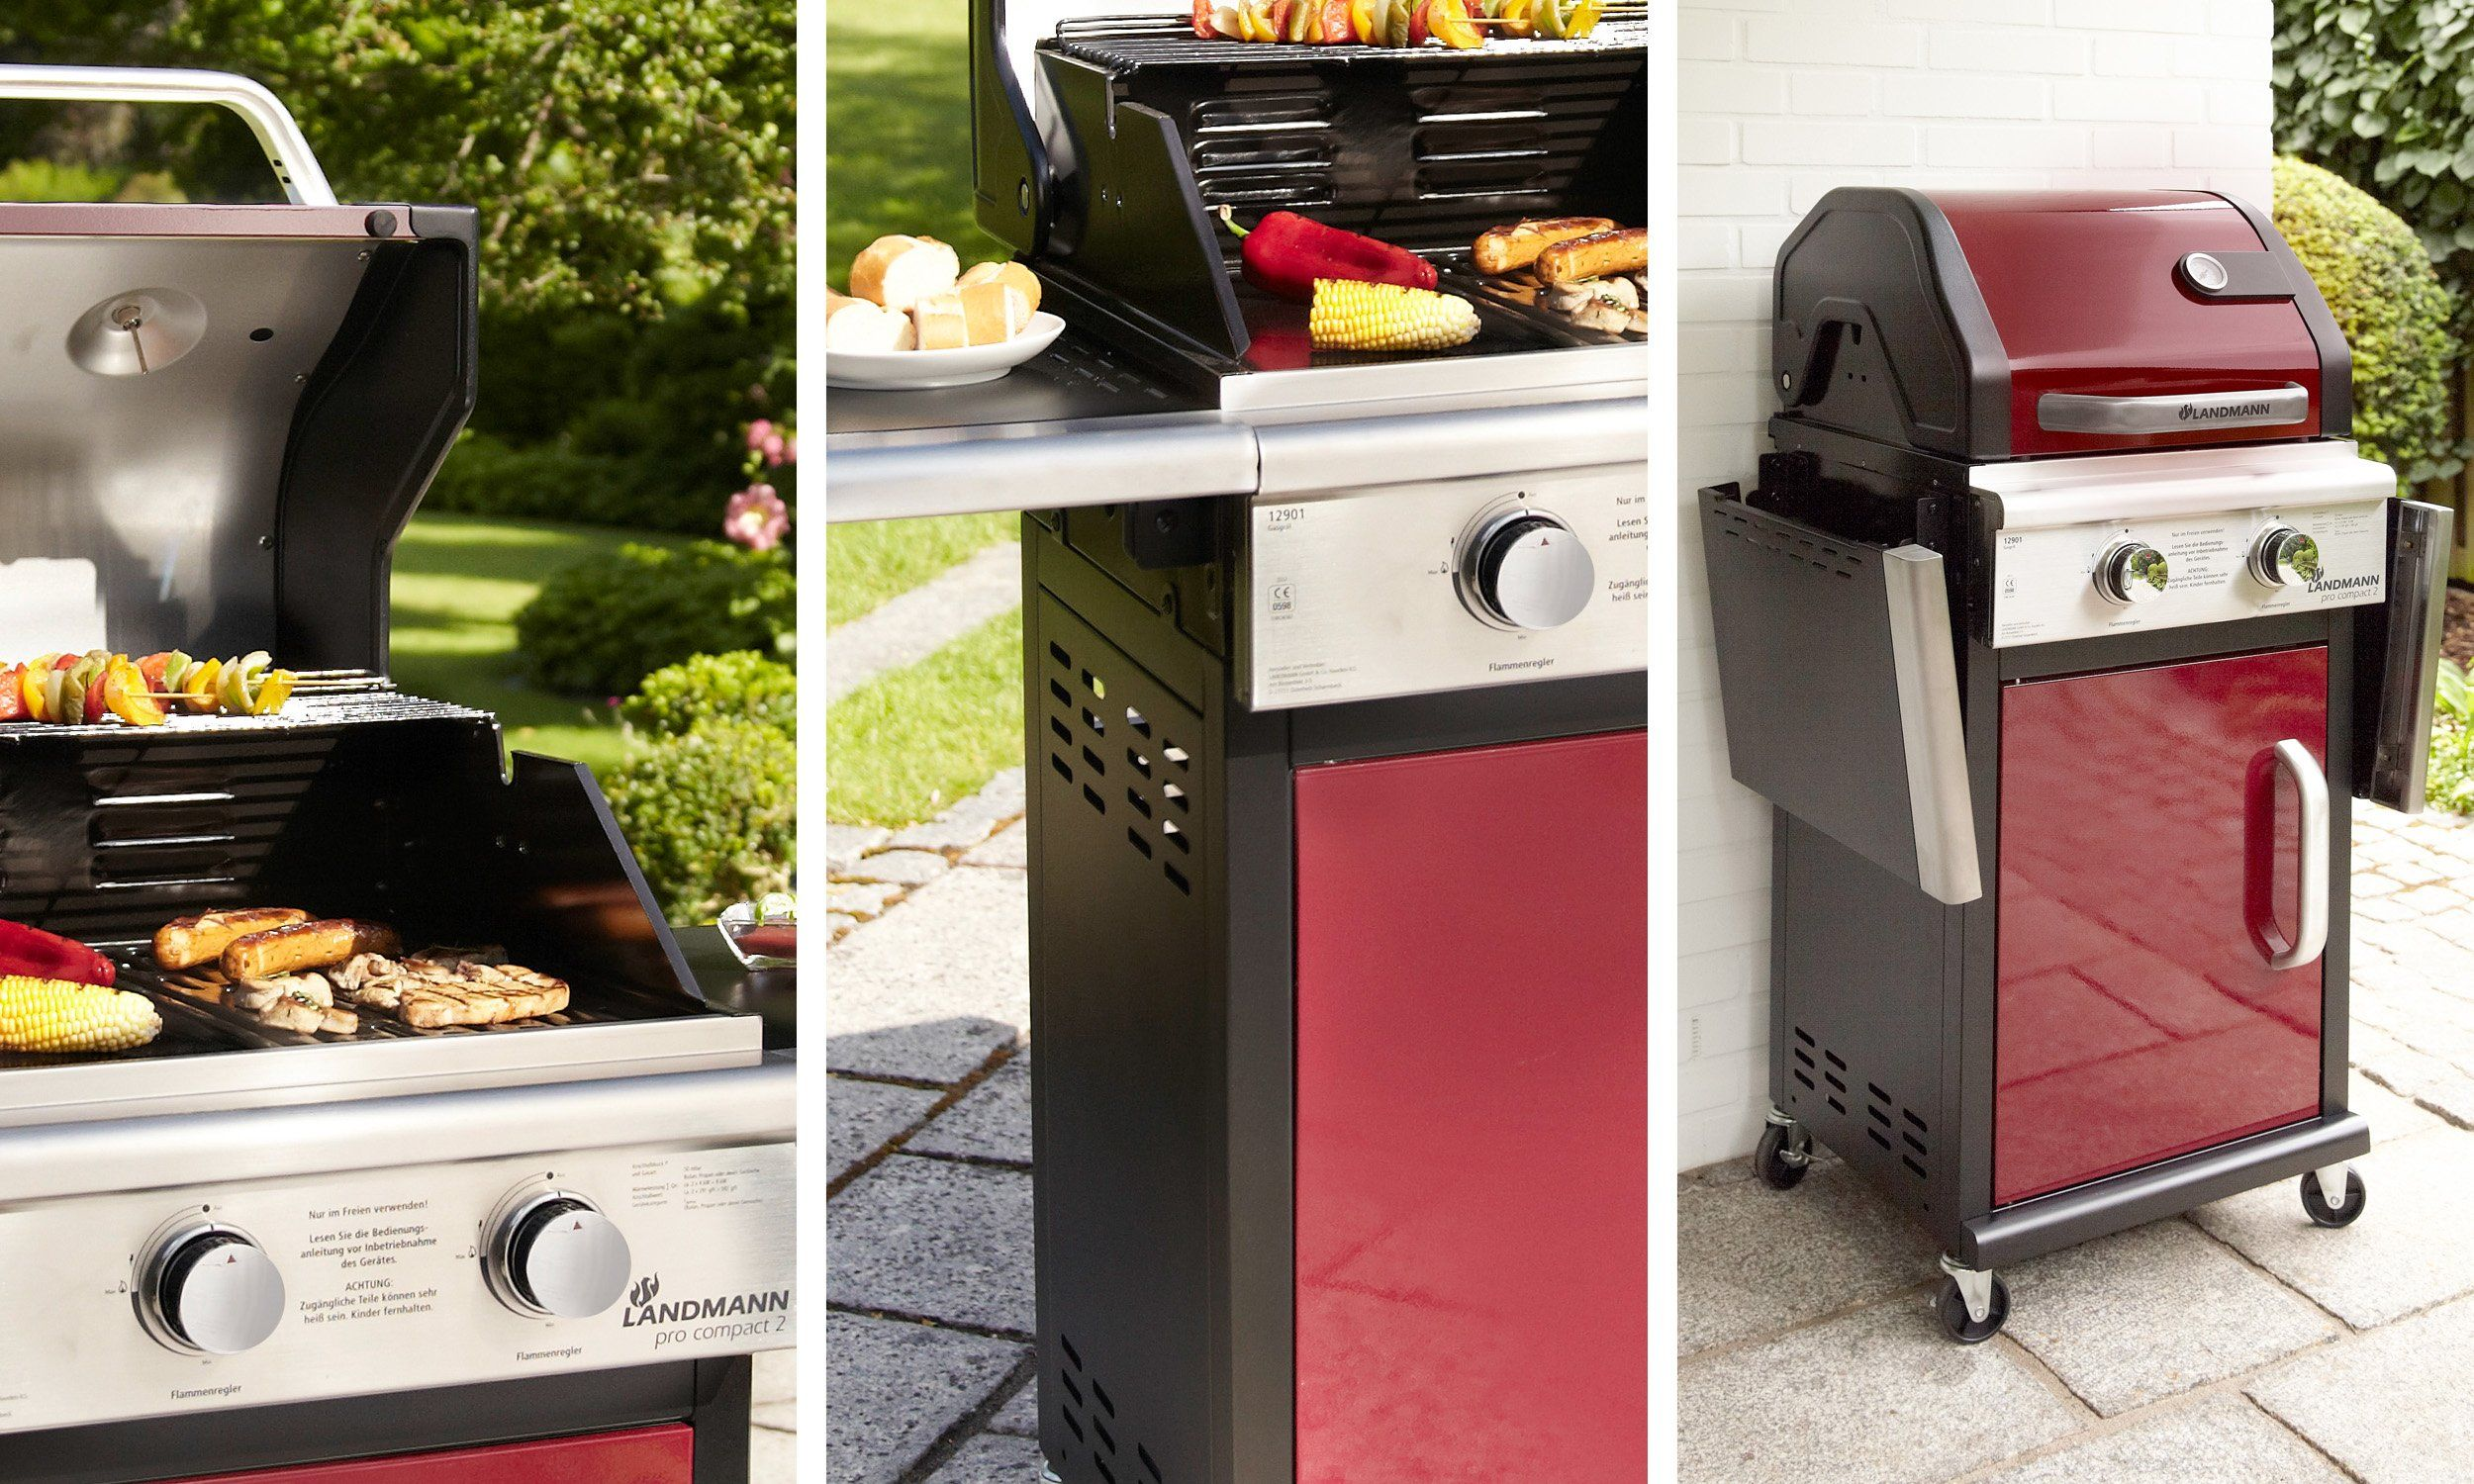 landmann triton 2 0 pts niepozorny grill o wielkich mo liwo ciach grille grill360. Black Bedroom Furniture Sets. Home Design Ideas